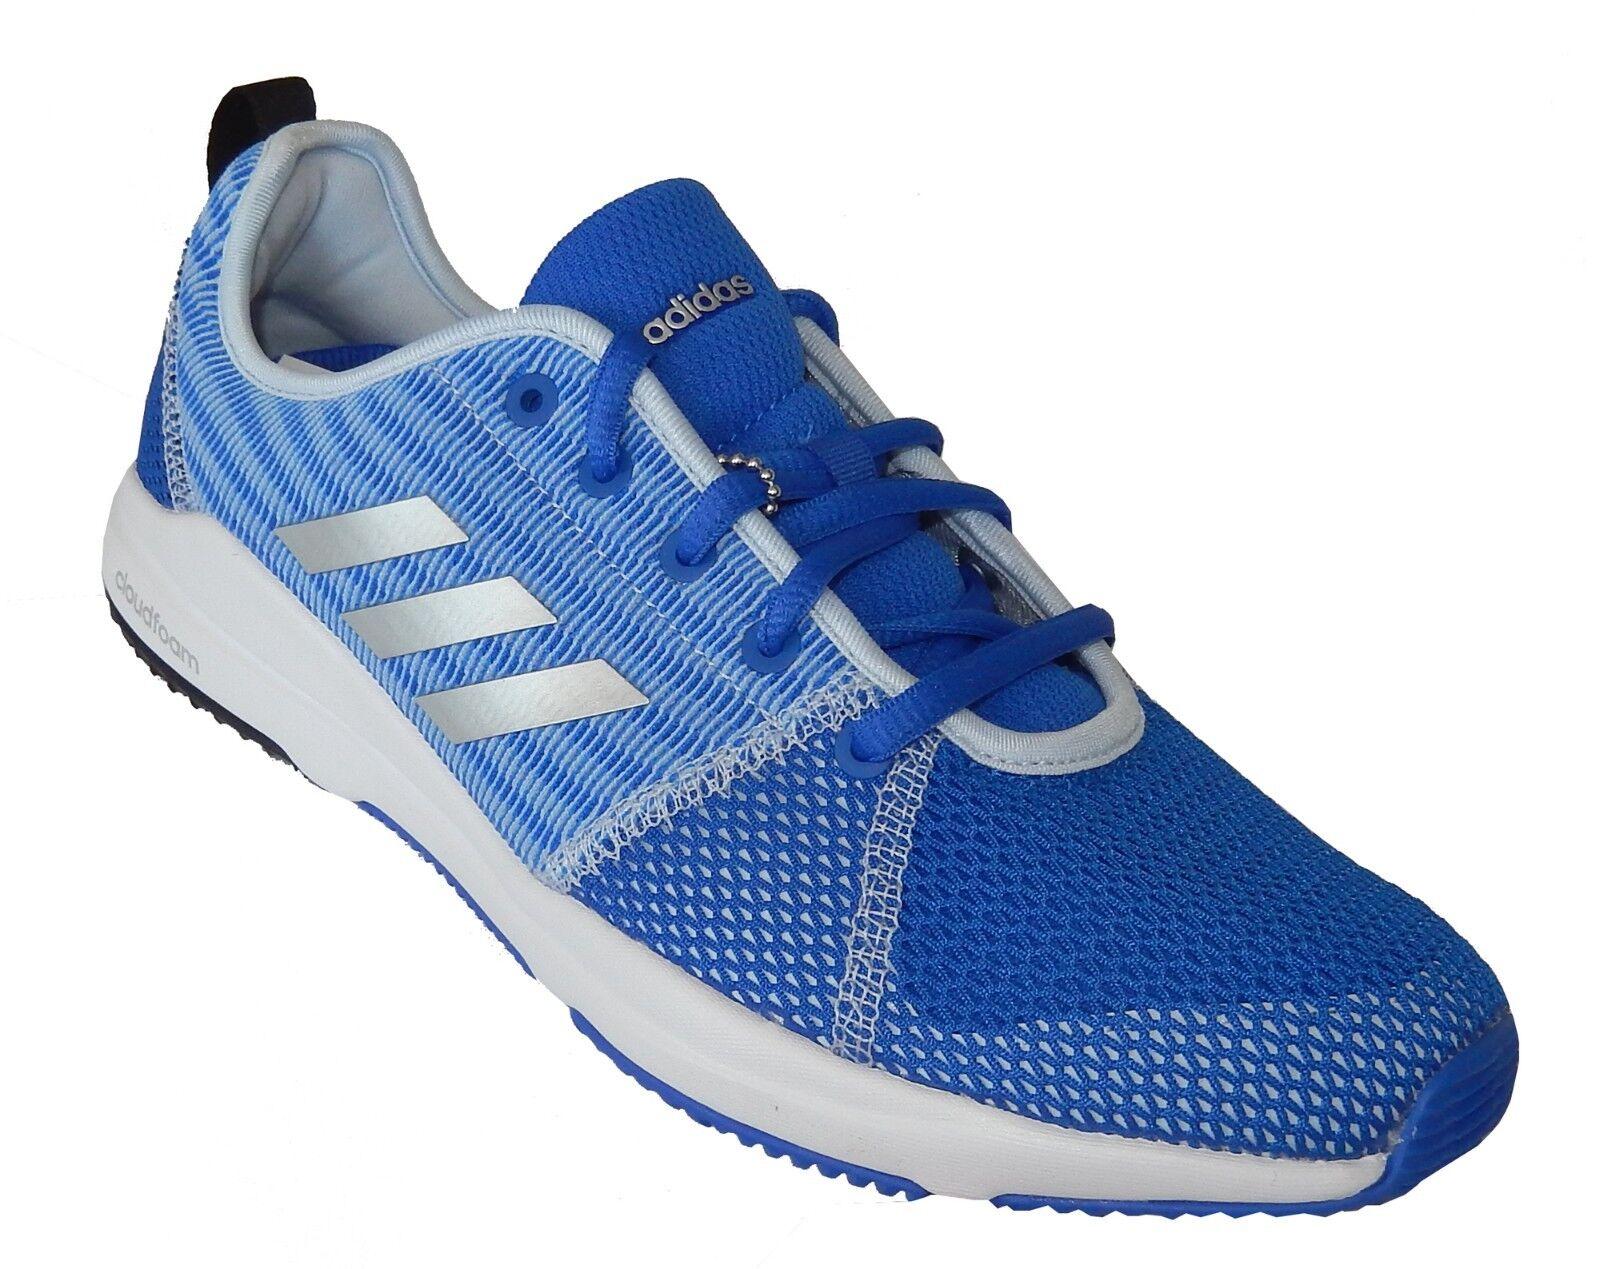 Adidas Women's Arianna Cloudfoam Running shoes